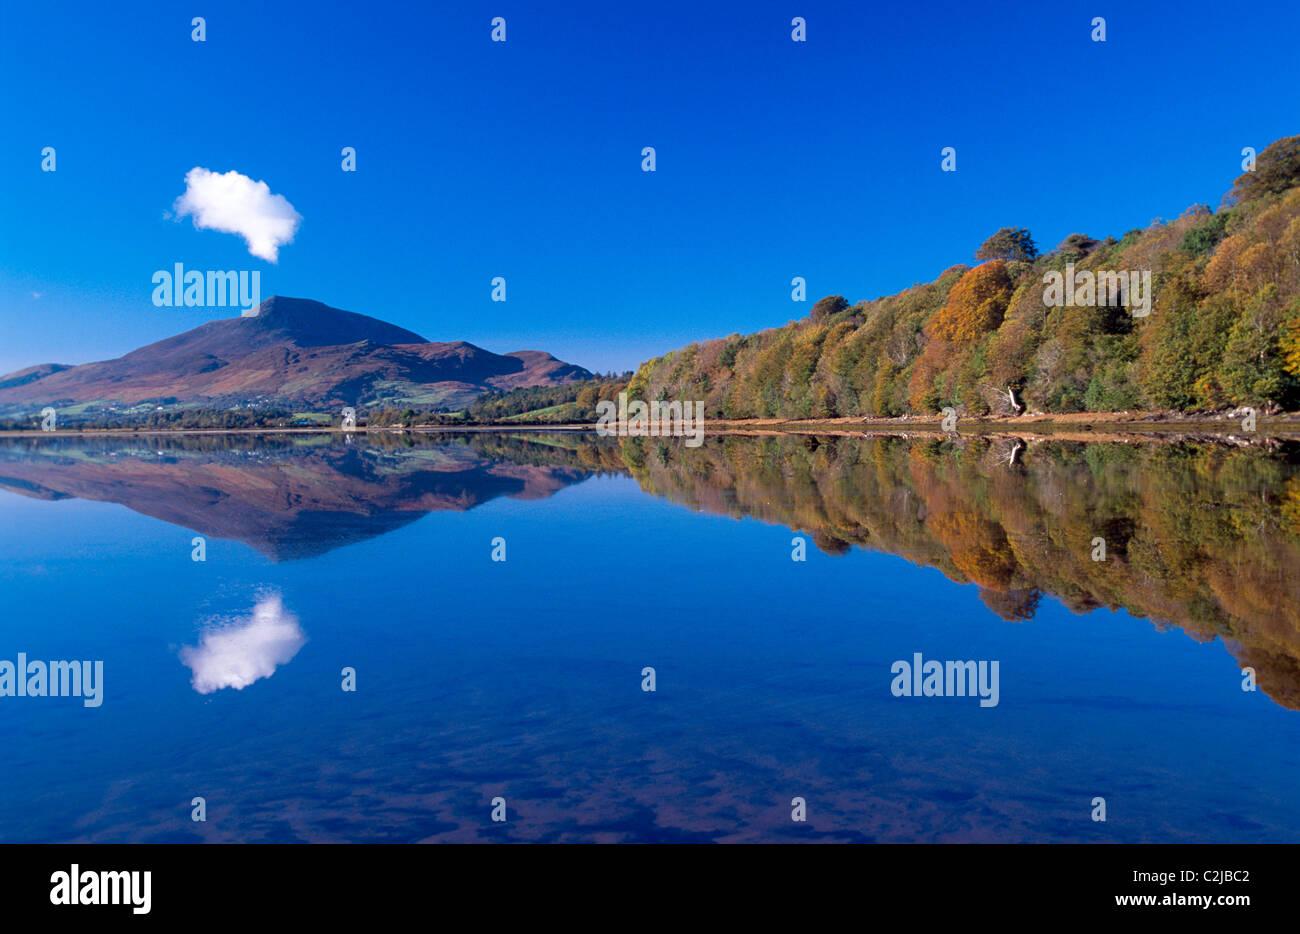 Herbst Reflexion des Muckish Berg, County Donegal, Irland. Stockbild